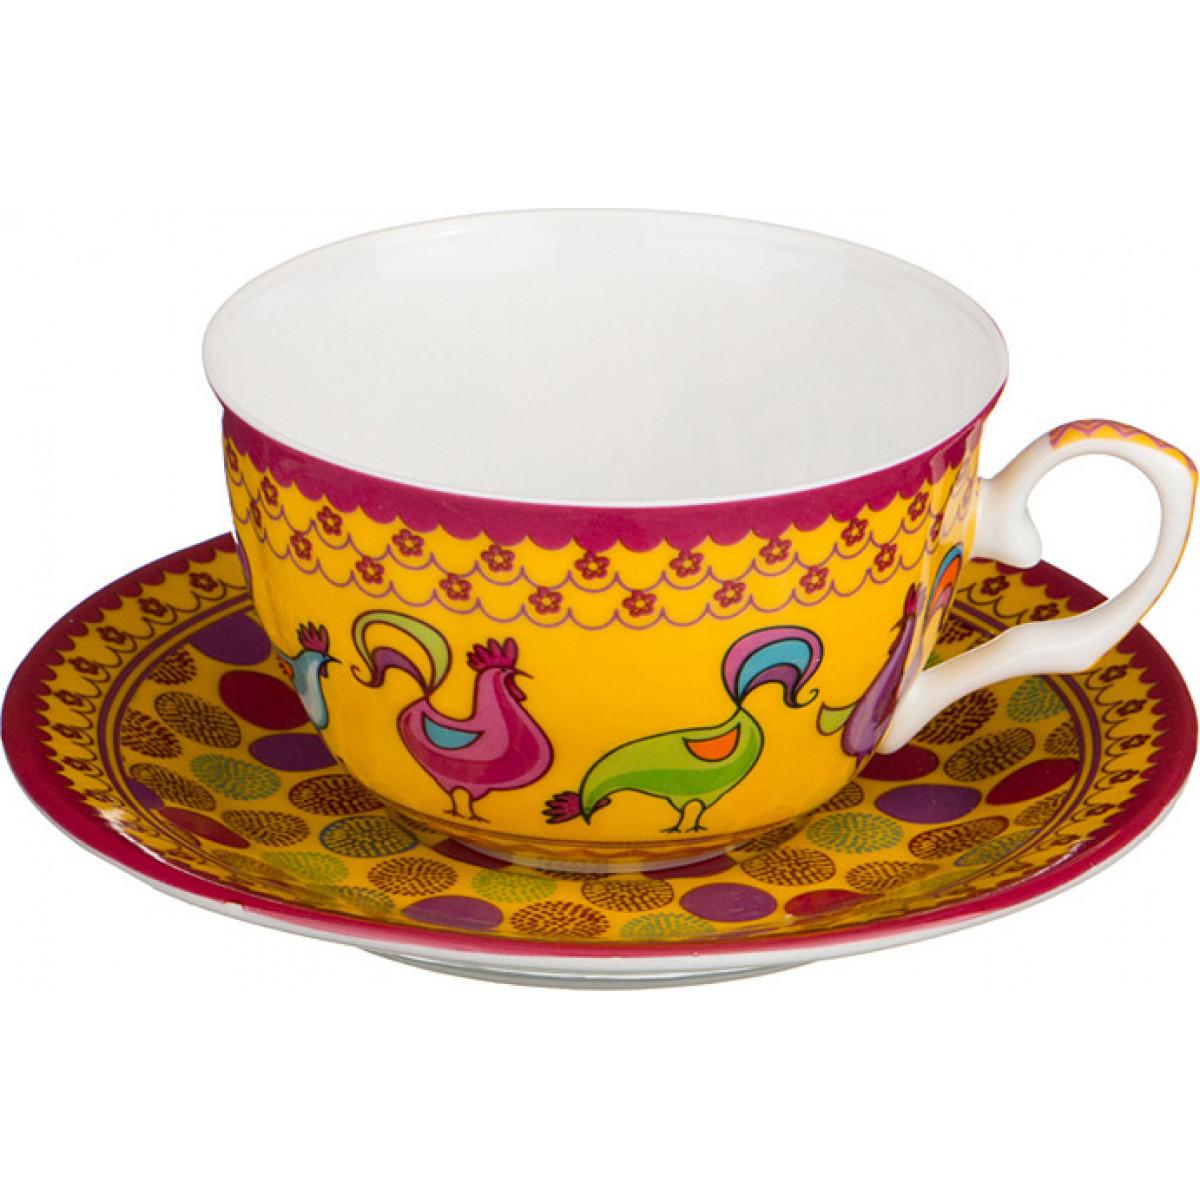 {} Lefard Чайная пара Myra  (250 мл) наборы для чаепития lefard чайная пара венская классика 230мл